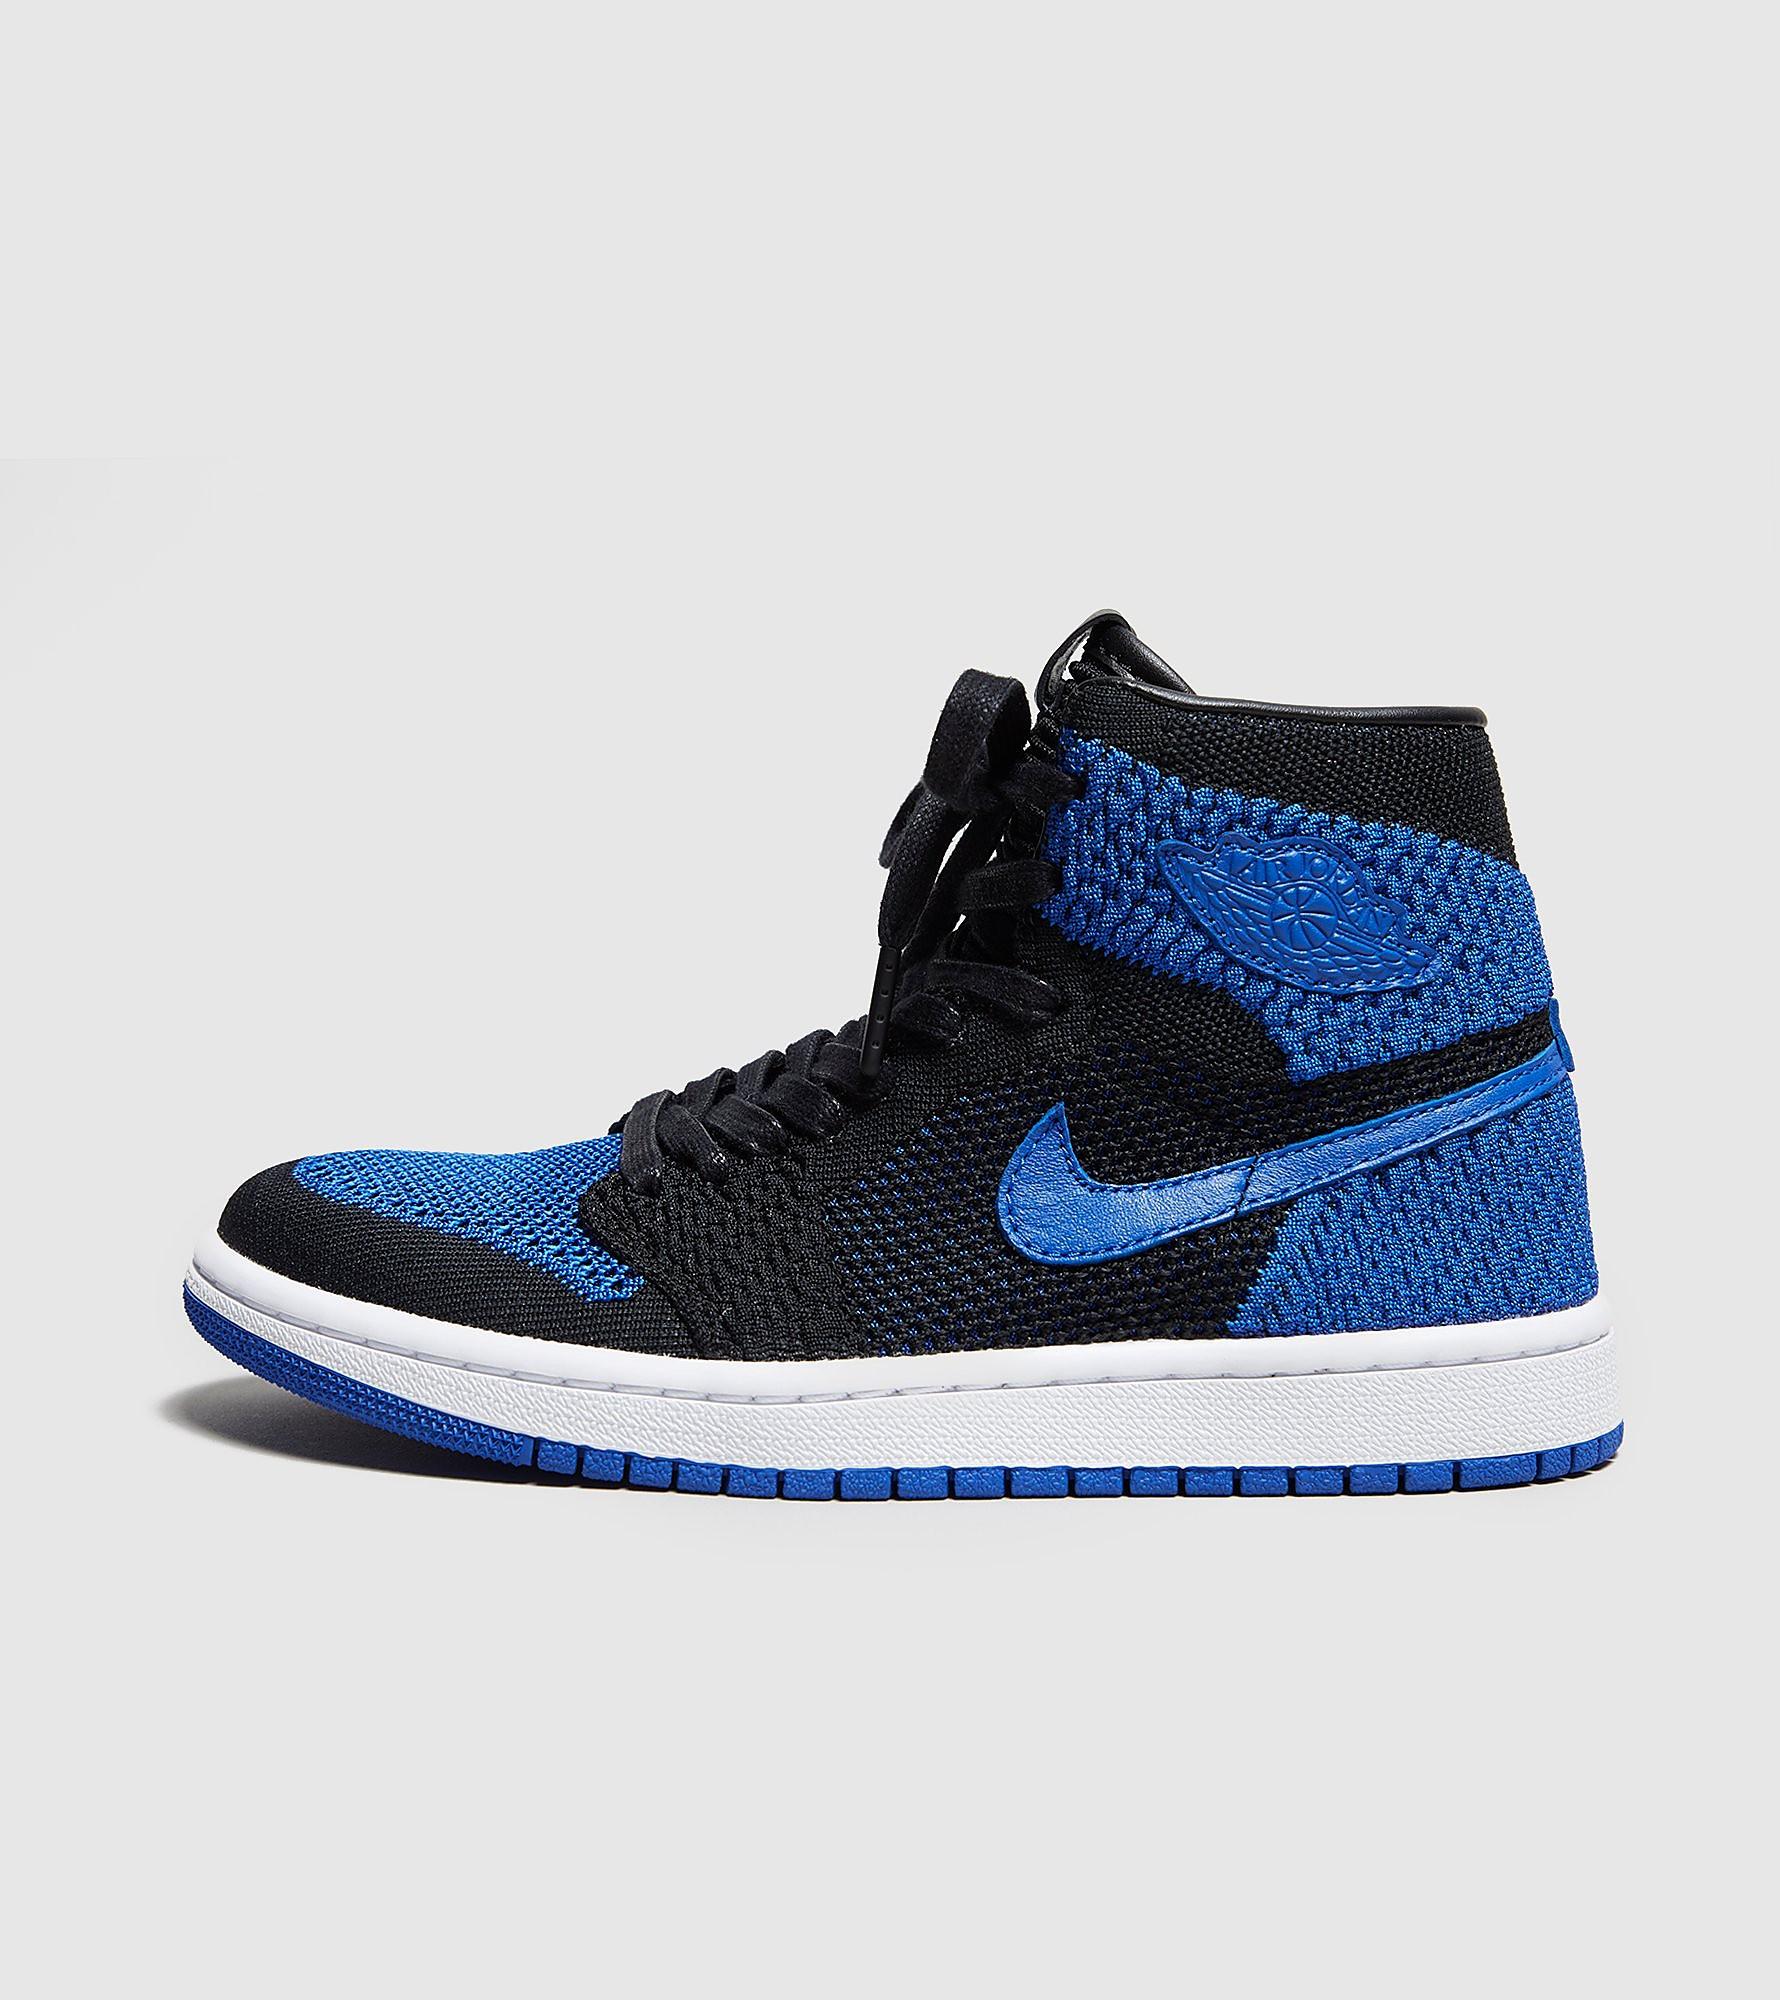 Nike Air Jordan 1 HI Flyknit Til Kvinder